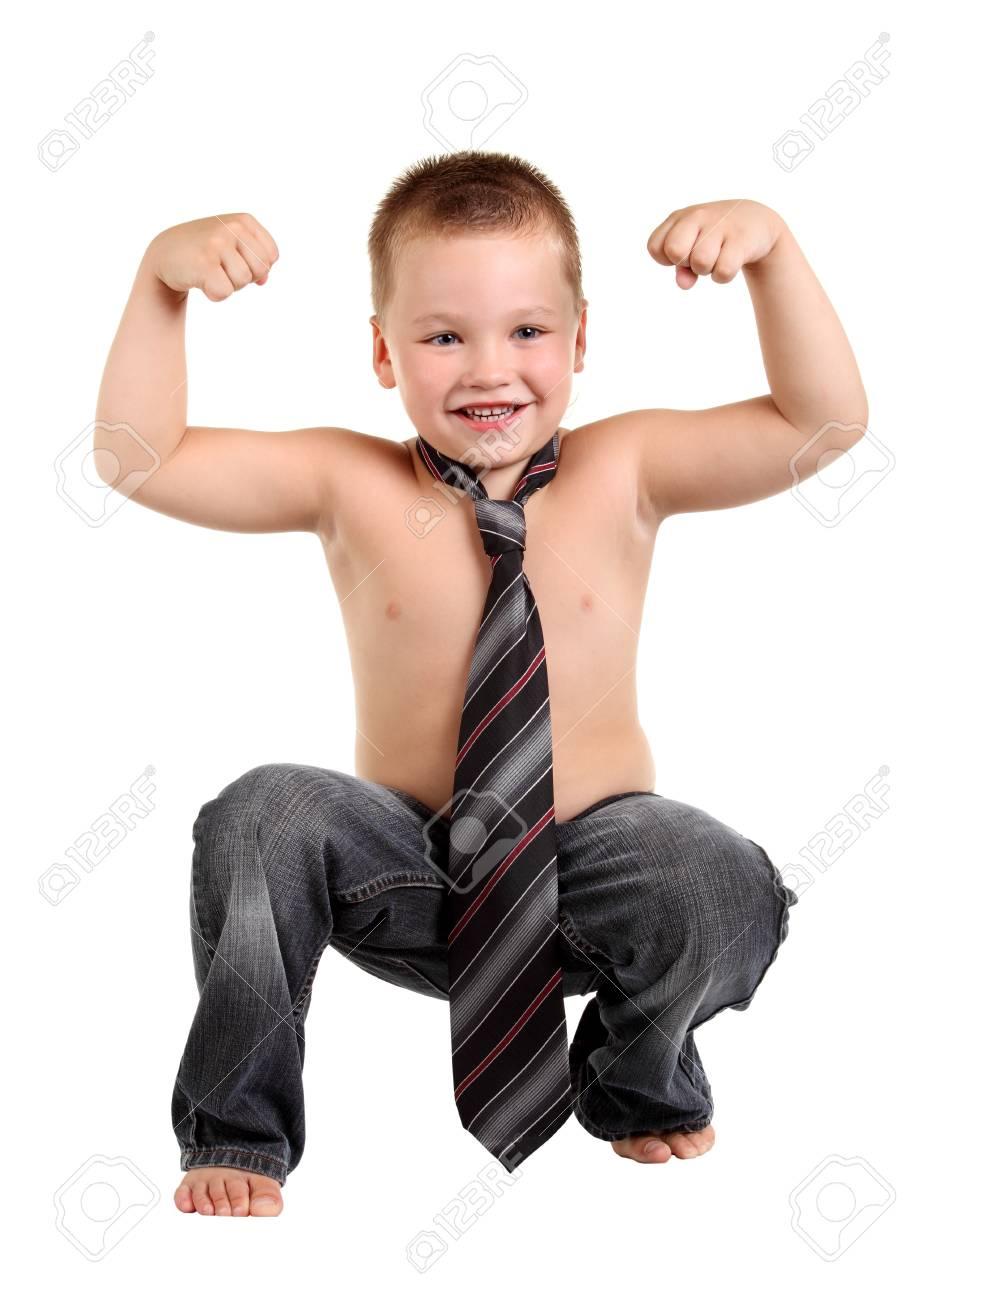 Little boy necktie on the white background Stock Photo - 12163099